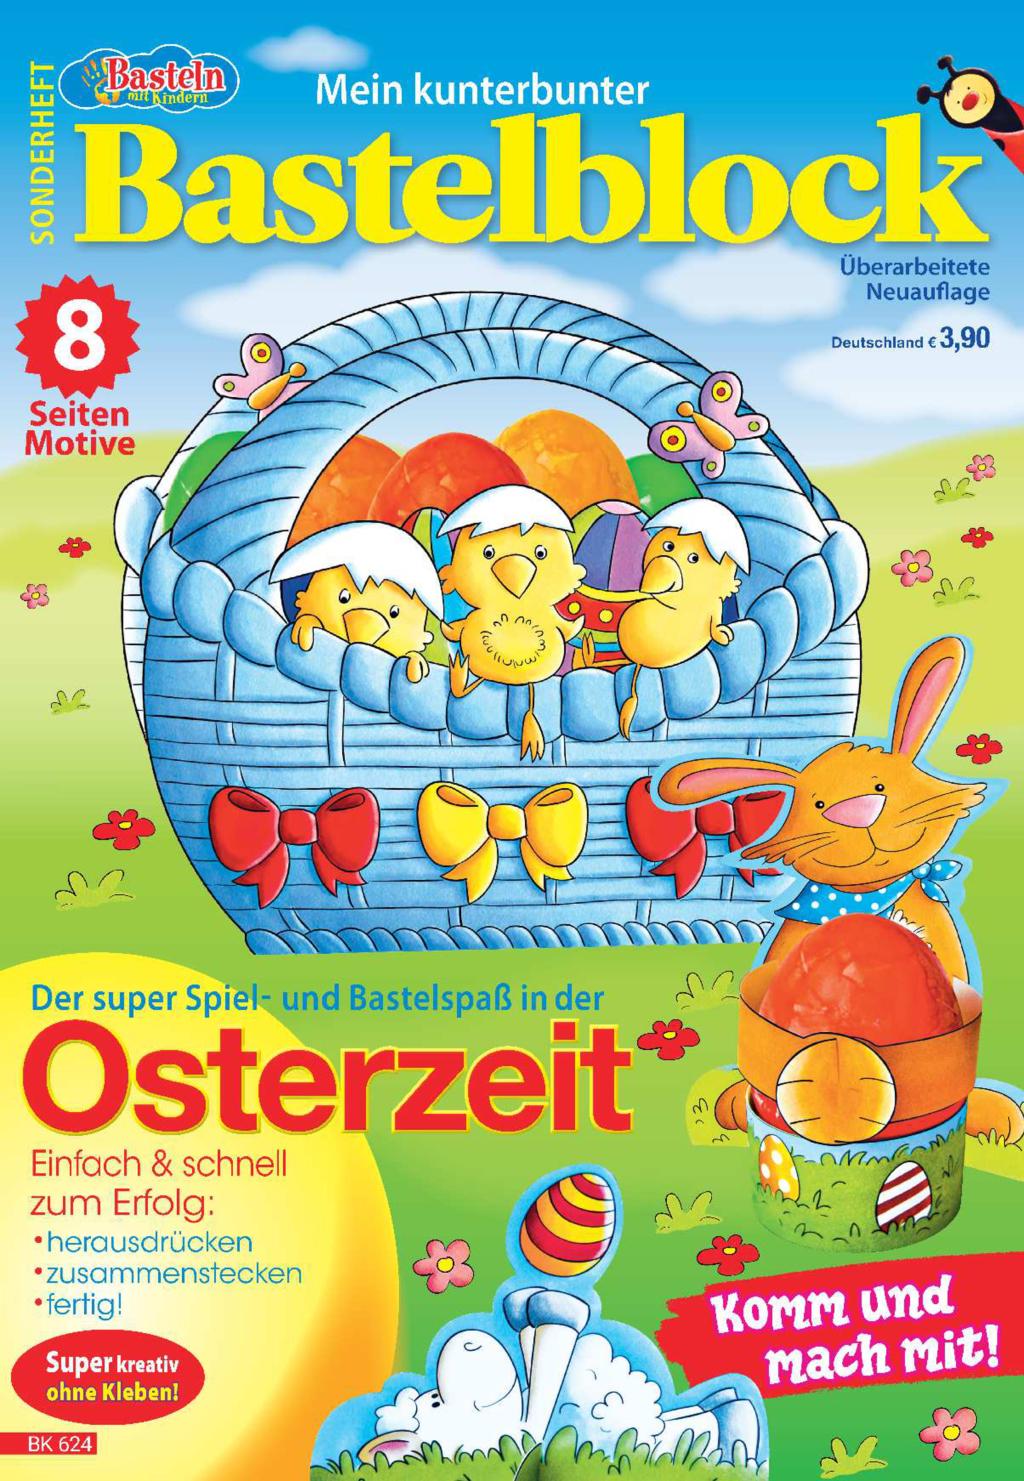 Basteln mit Kinder Sonderheft BK 624 - Bastelblock Ostern